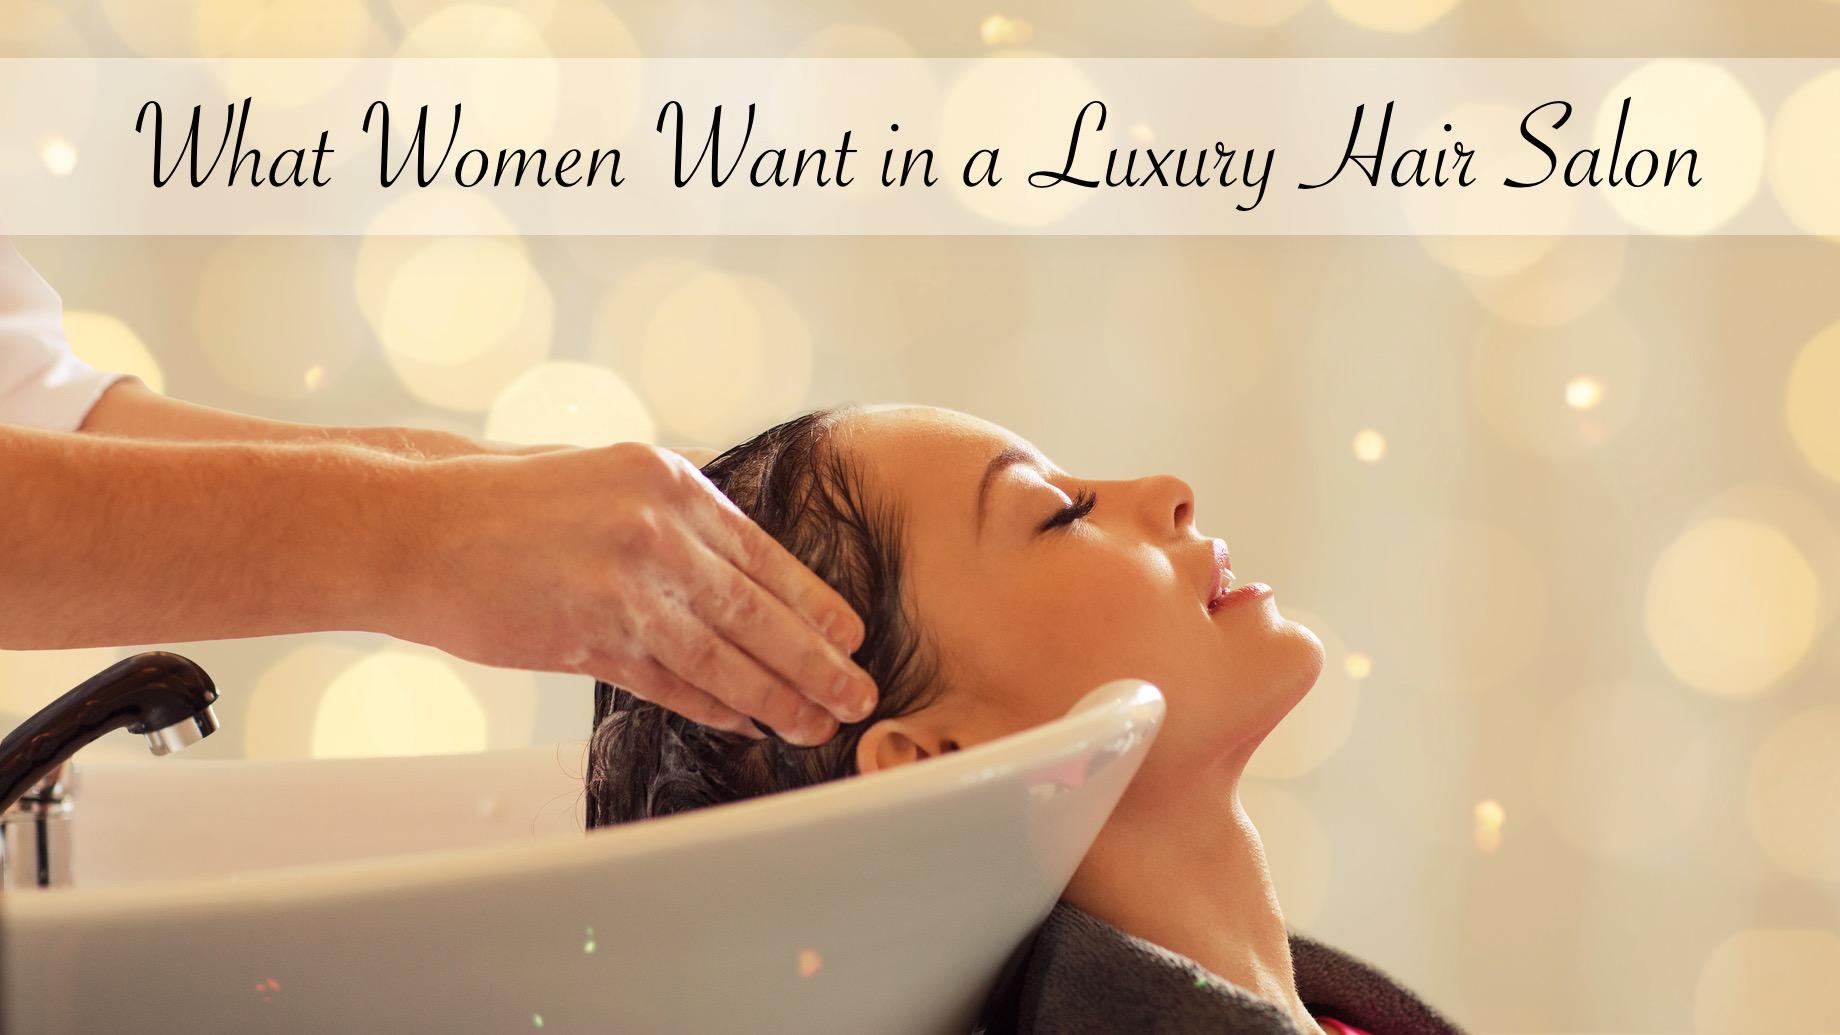 What Women Want in a Luxury Hair Salon